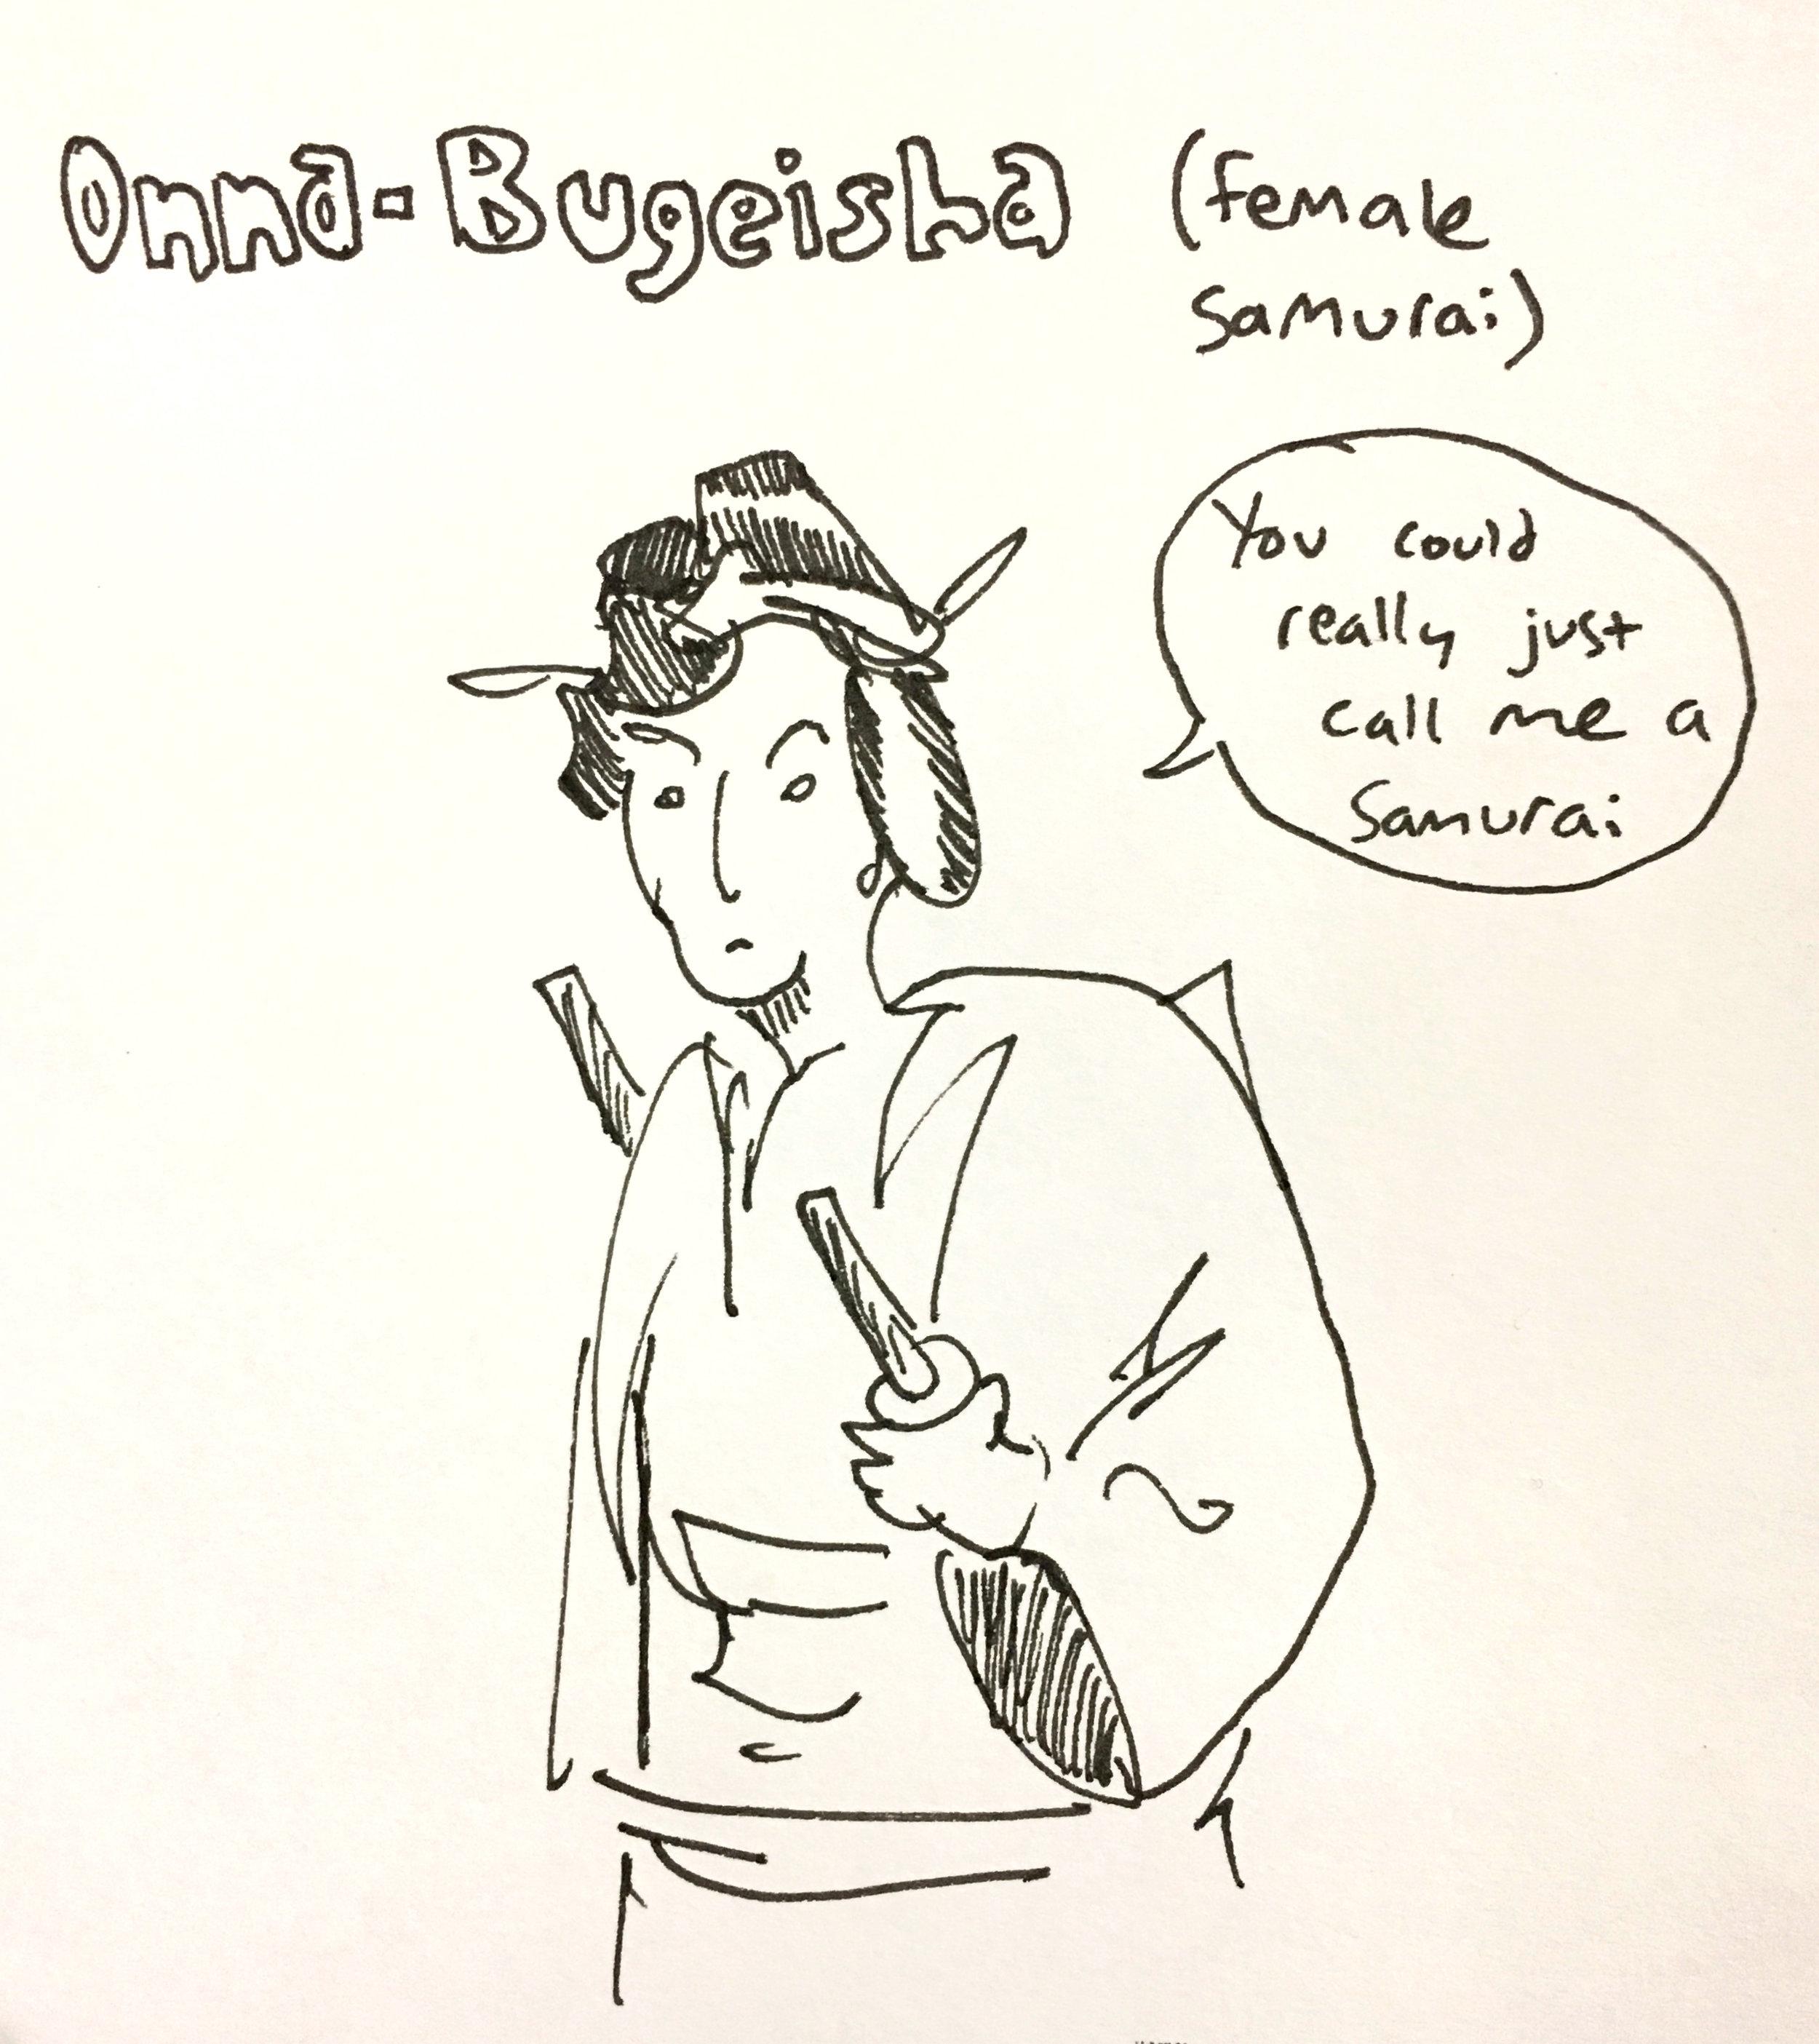 """Female samurai (onna-bugeisha)"""